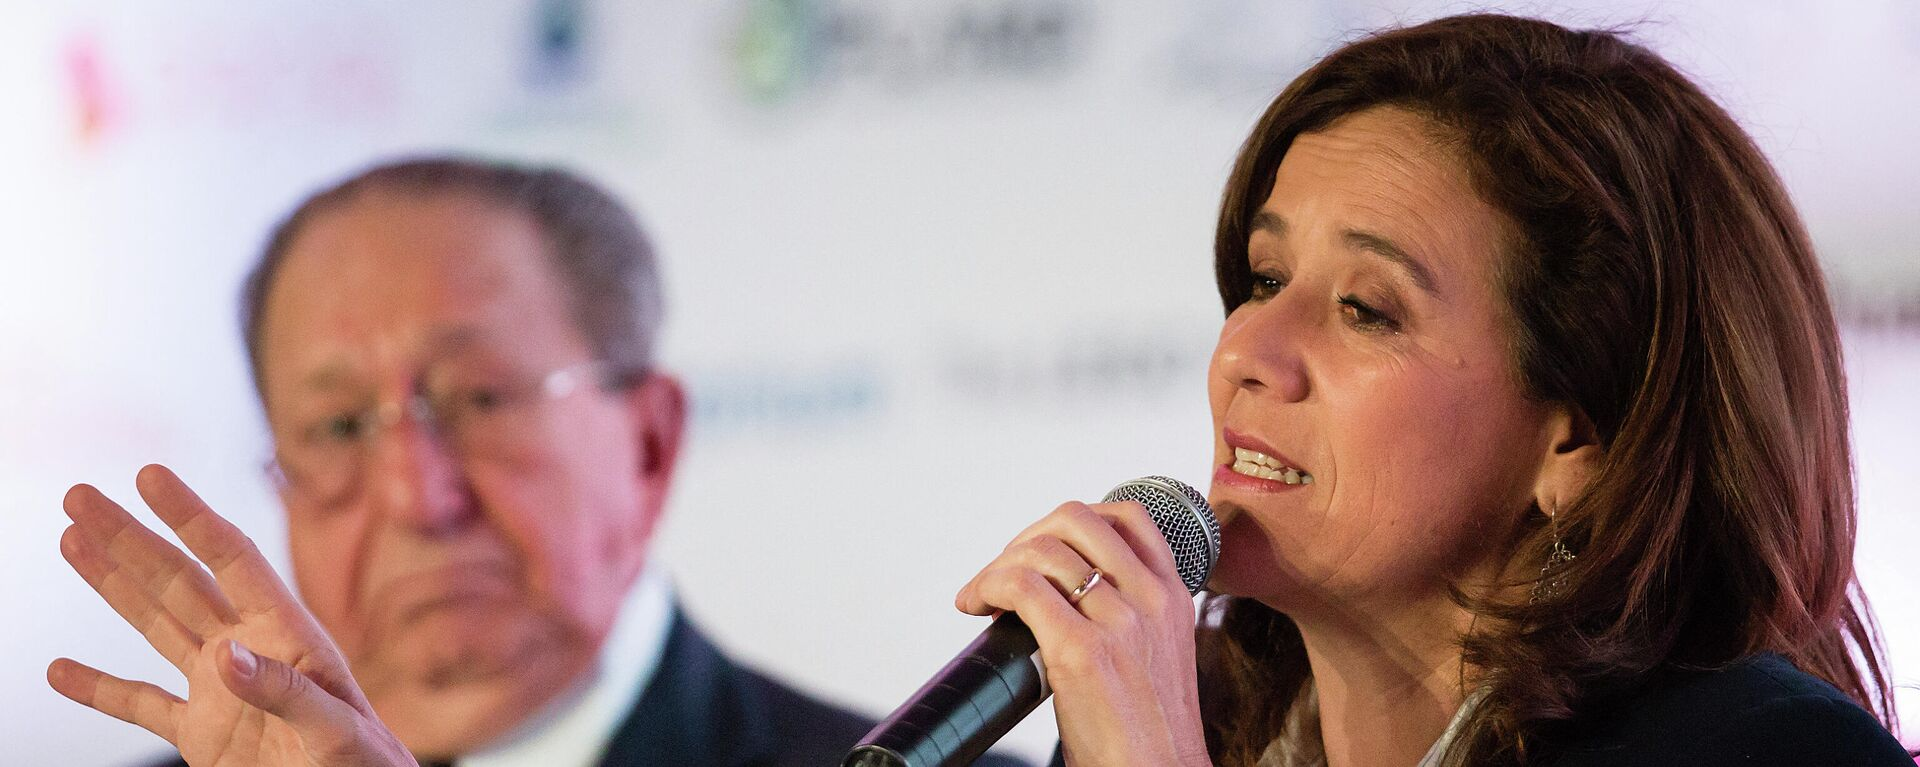 Margarita Zavala, la política mexicana, esposa del expresidente Felipe Calderón - Sputnik Mundo, 1920, 11.08.2021